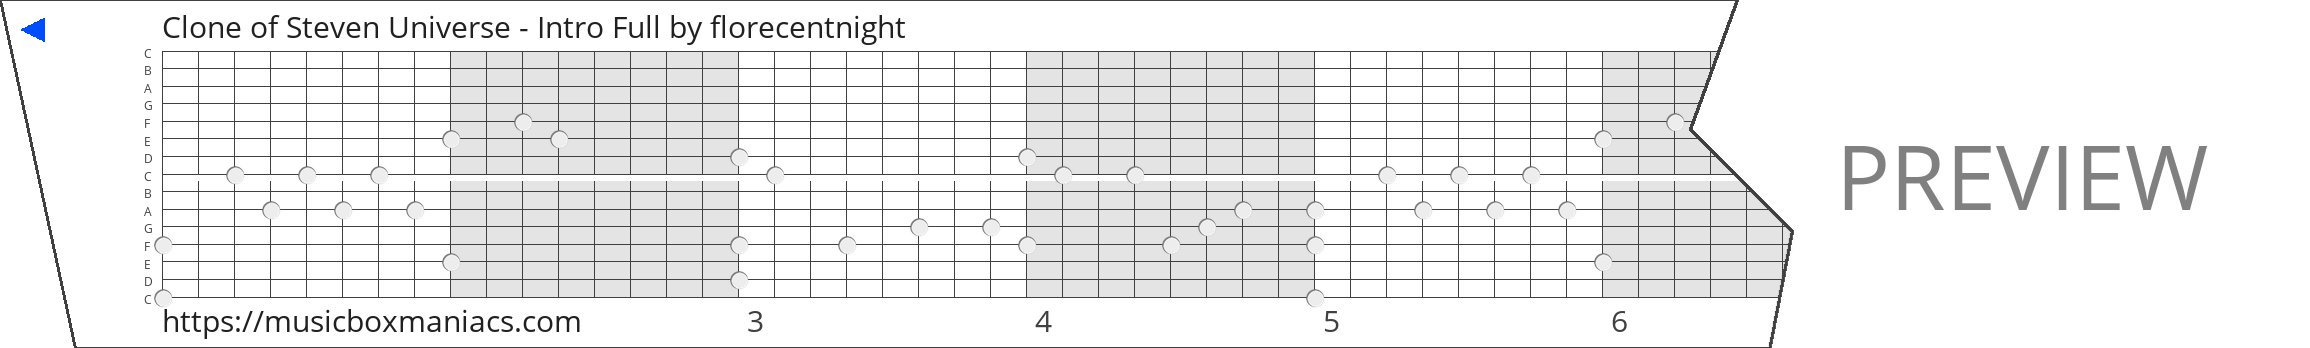 Clone of Steven Universe - Intro Full 15 note music box paper strip